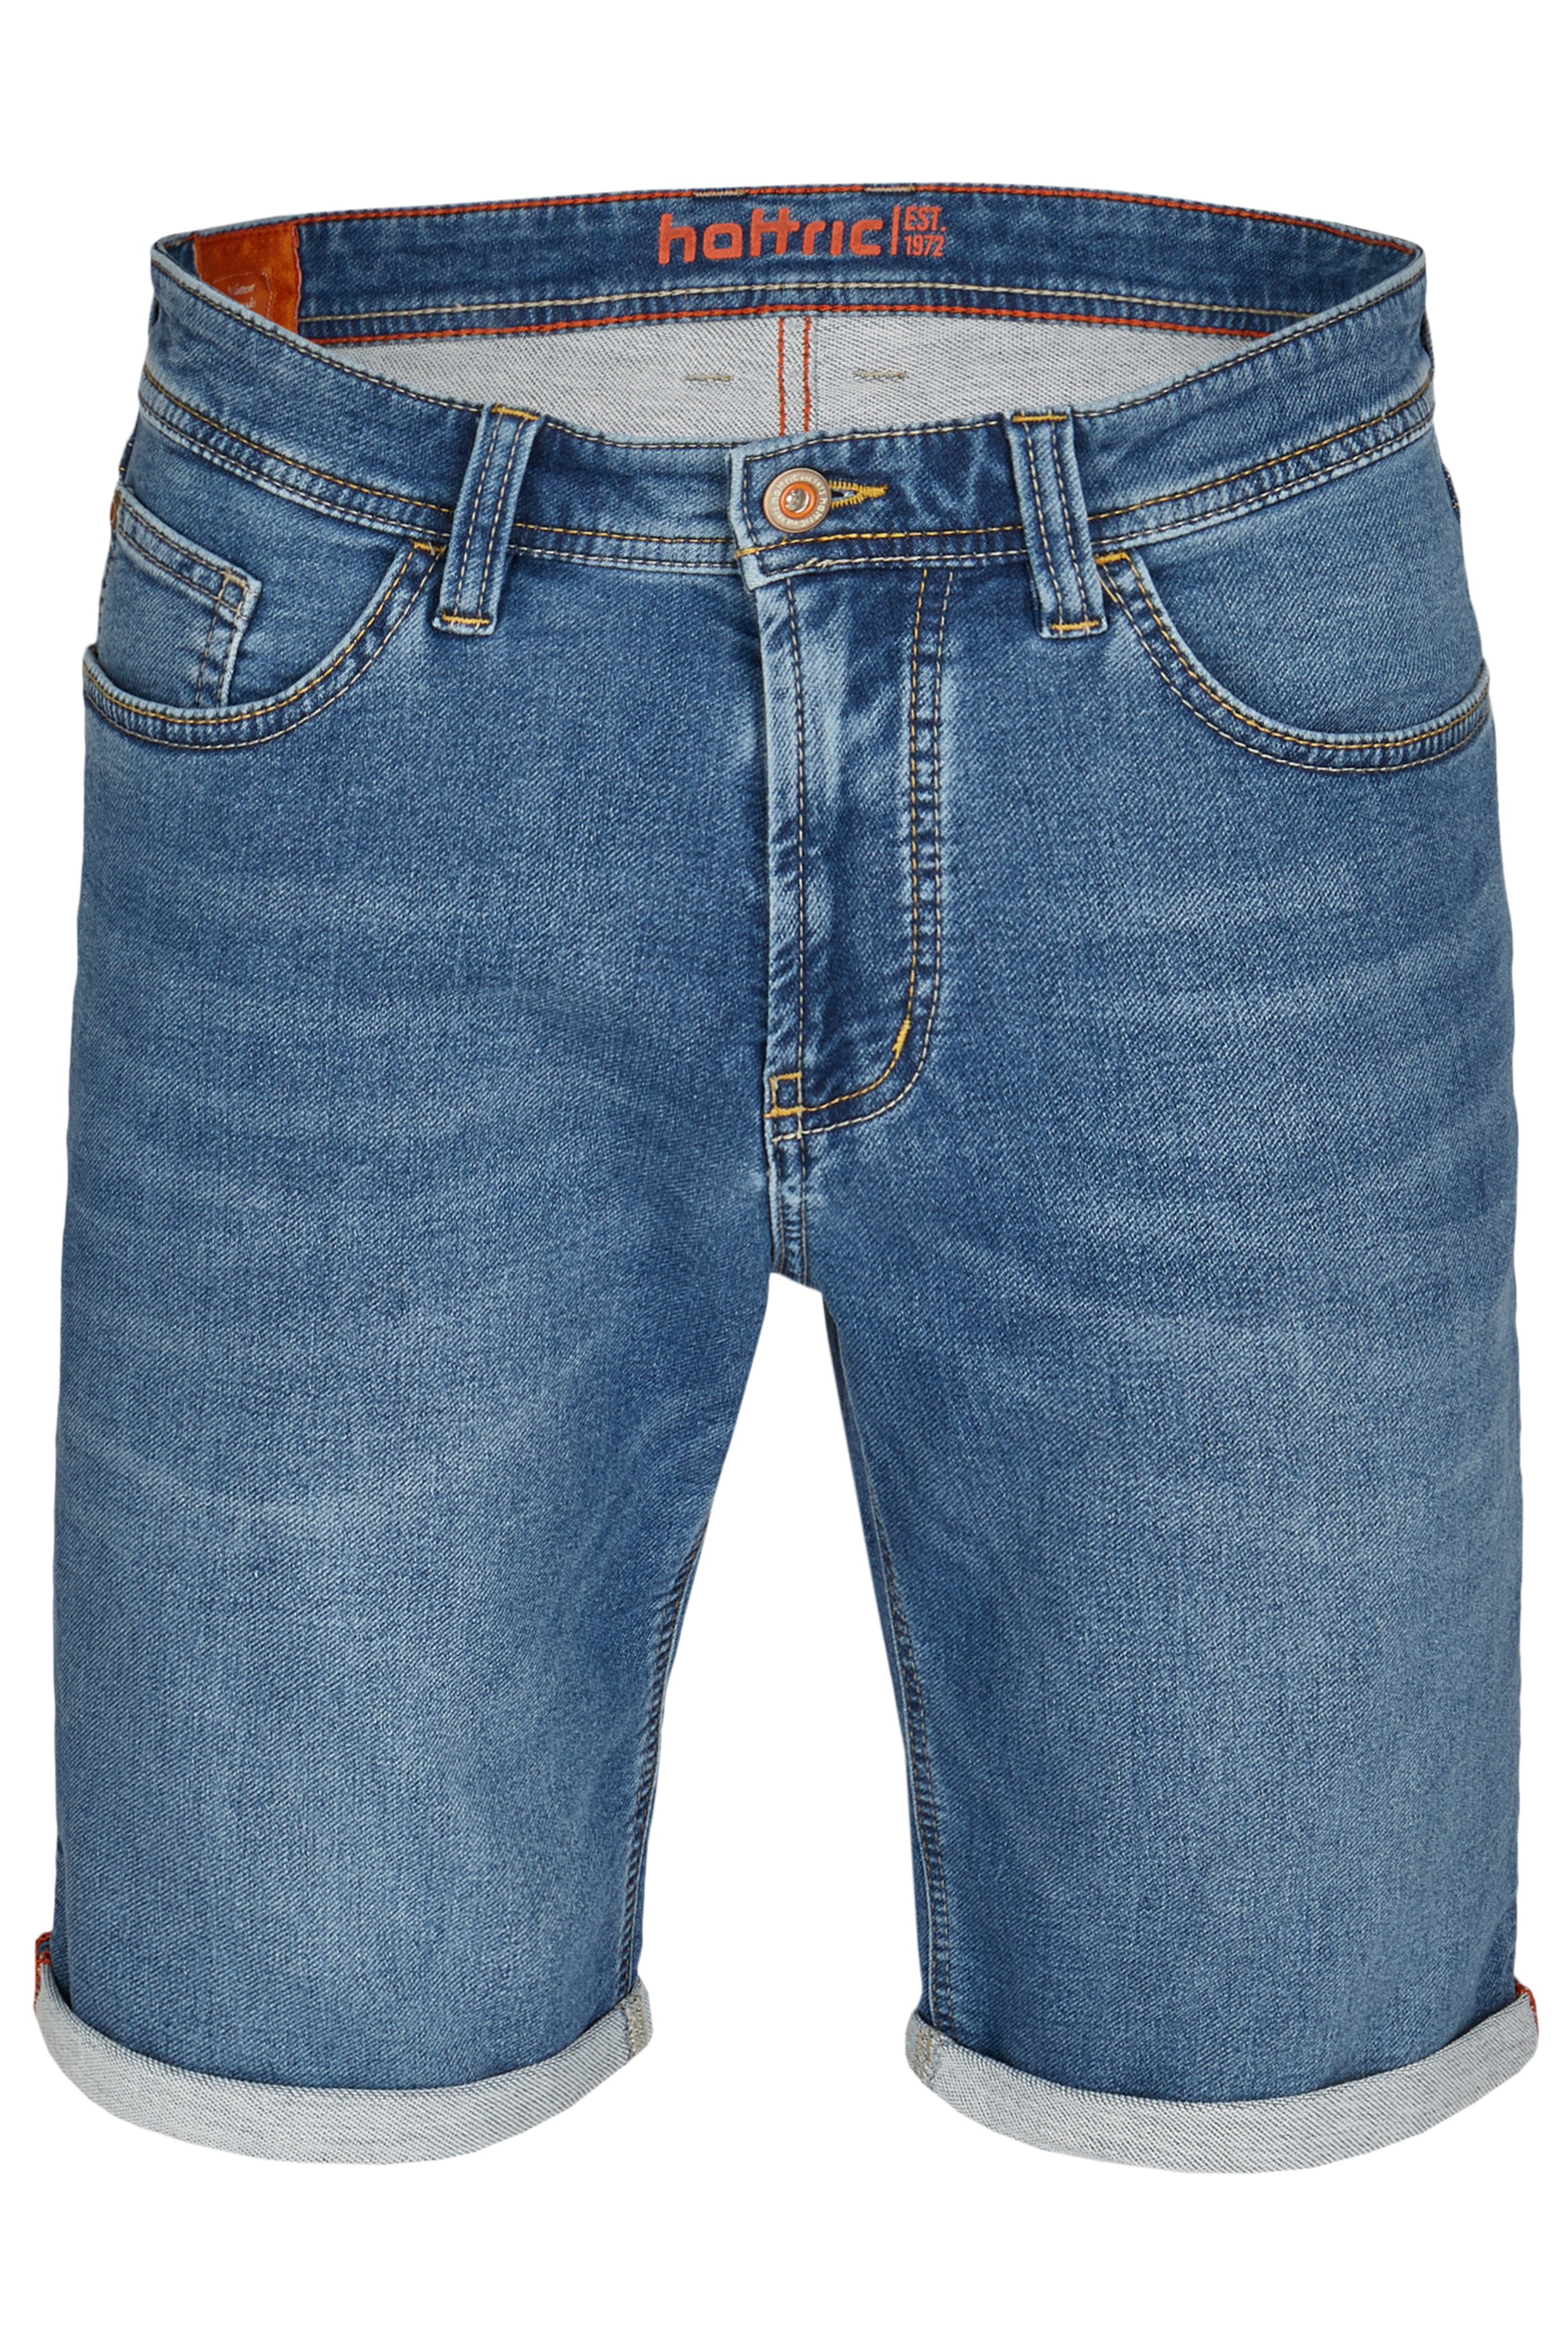 Hattric Jeans Bermuda kurze Hose